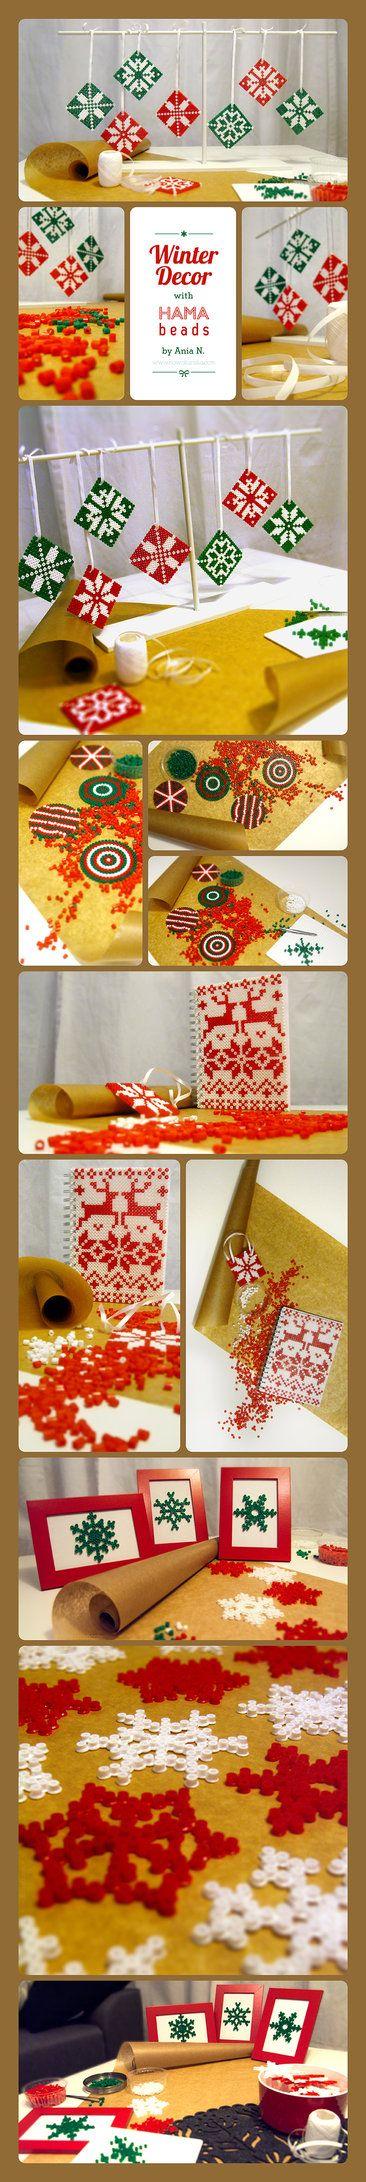 Winter Decor with Hama beads, made by Ania Nowokunska, Warsaw, Poland